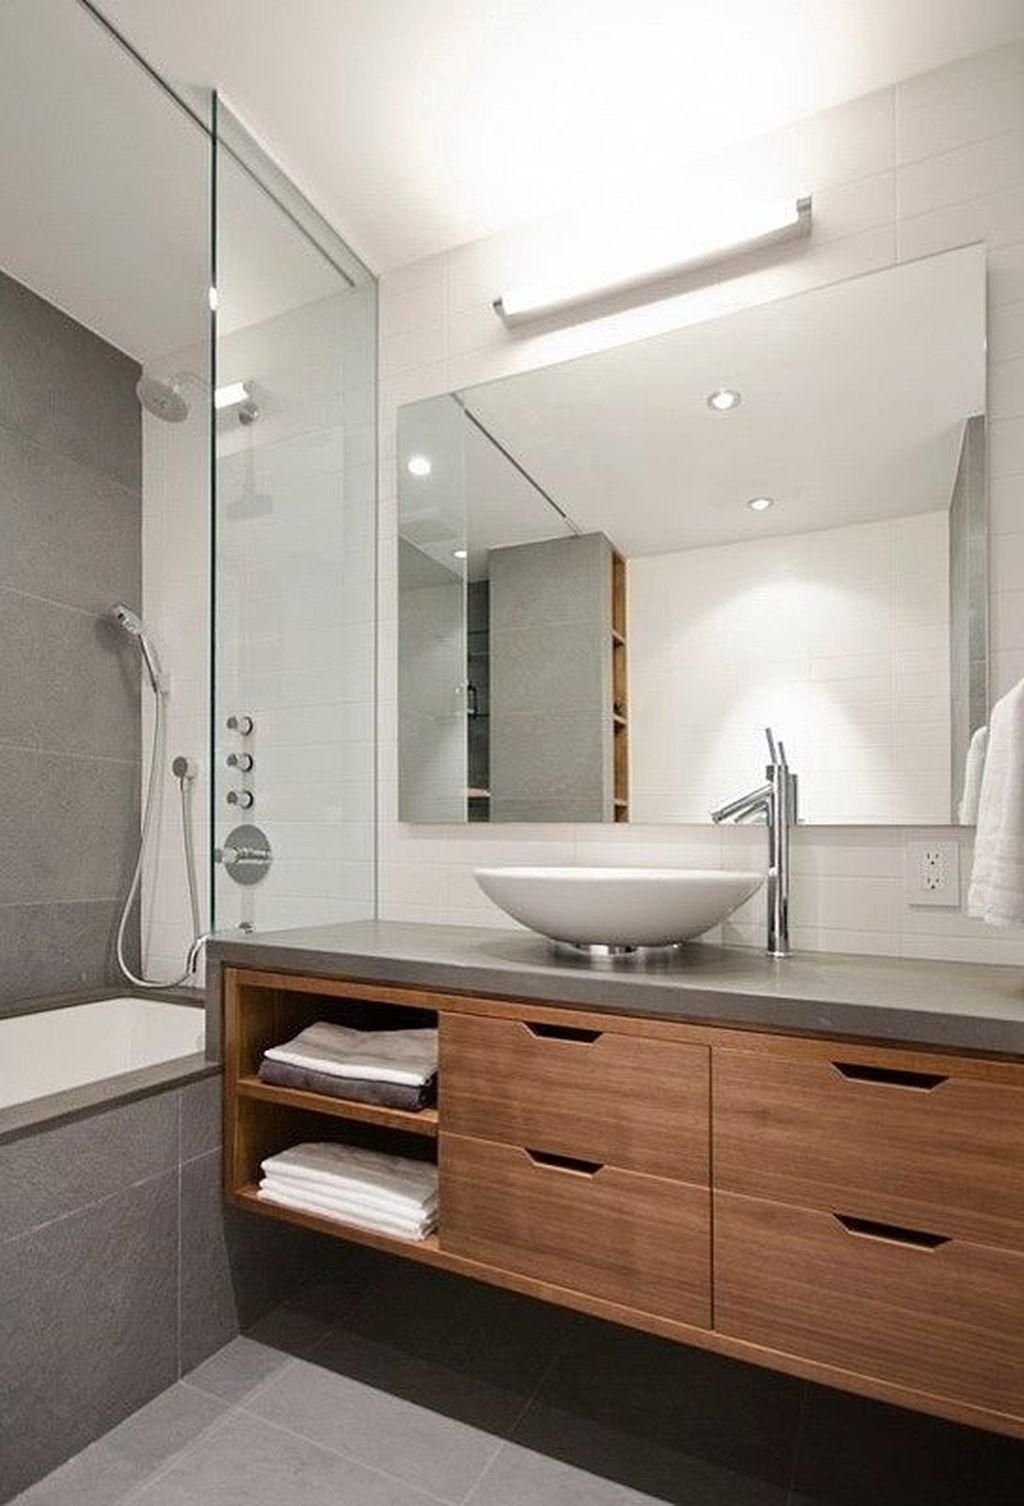 20 Inspiring Bathroom Vanity Design Ideas Bathroom Interior